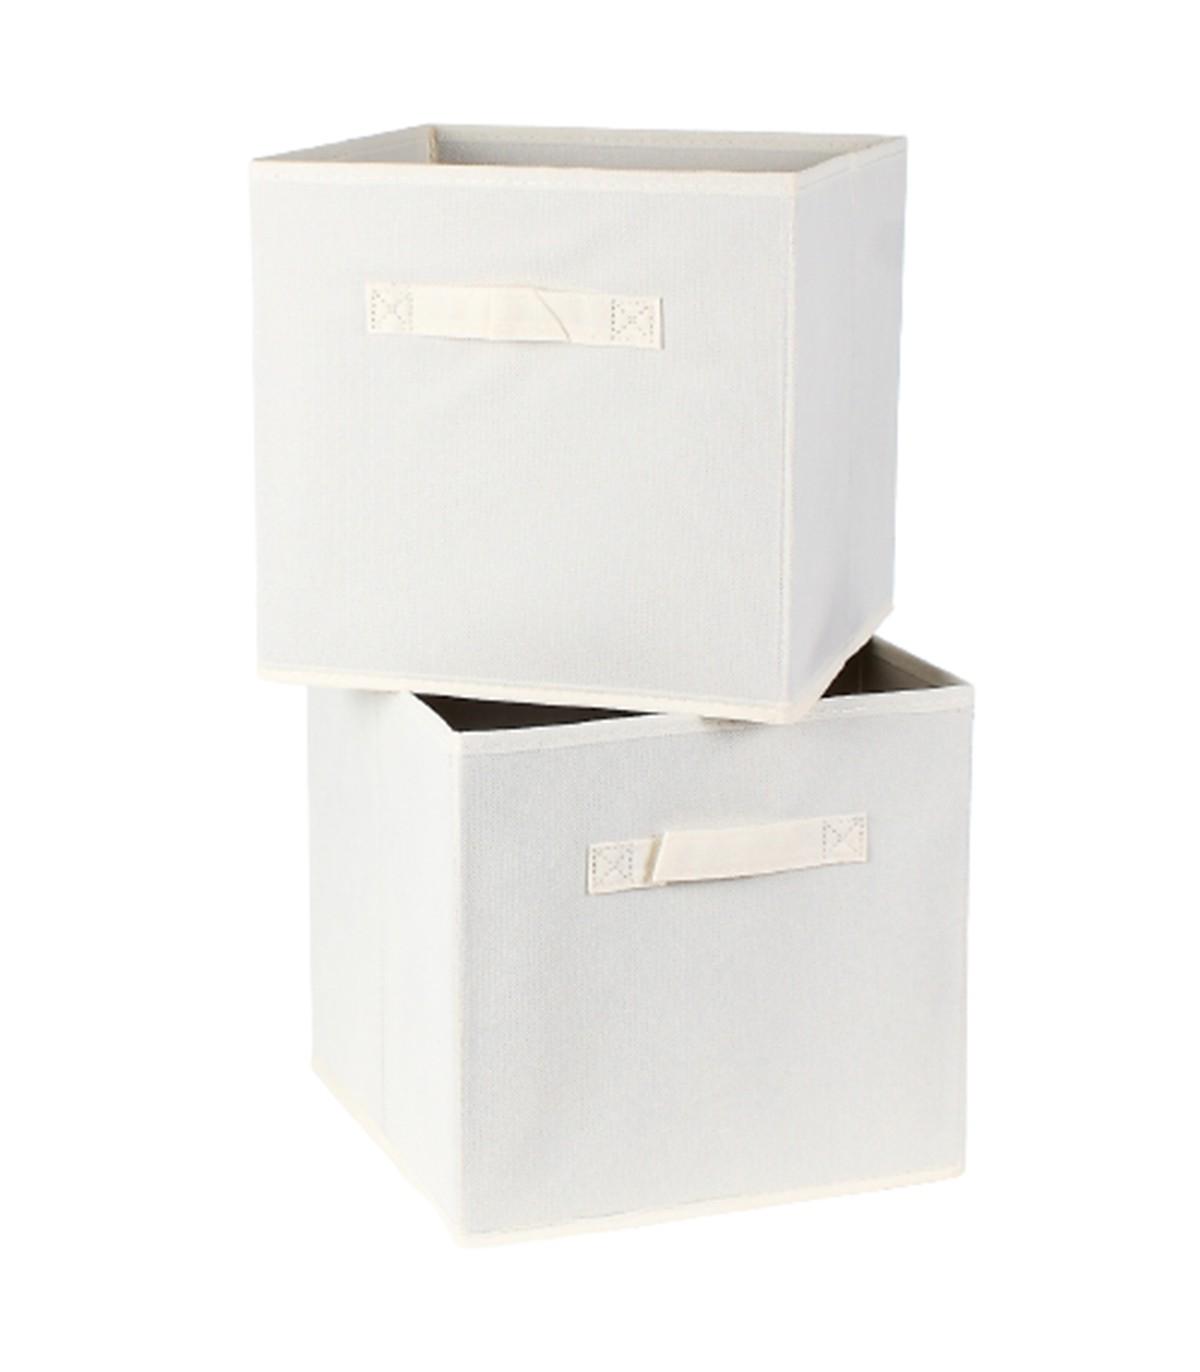 Cube de rangement intissé 28x28cm - Lot de 2 - Blanc